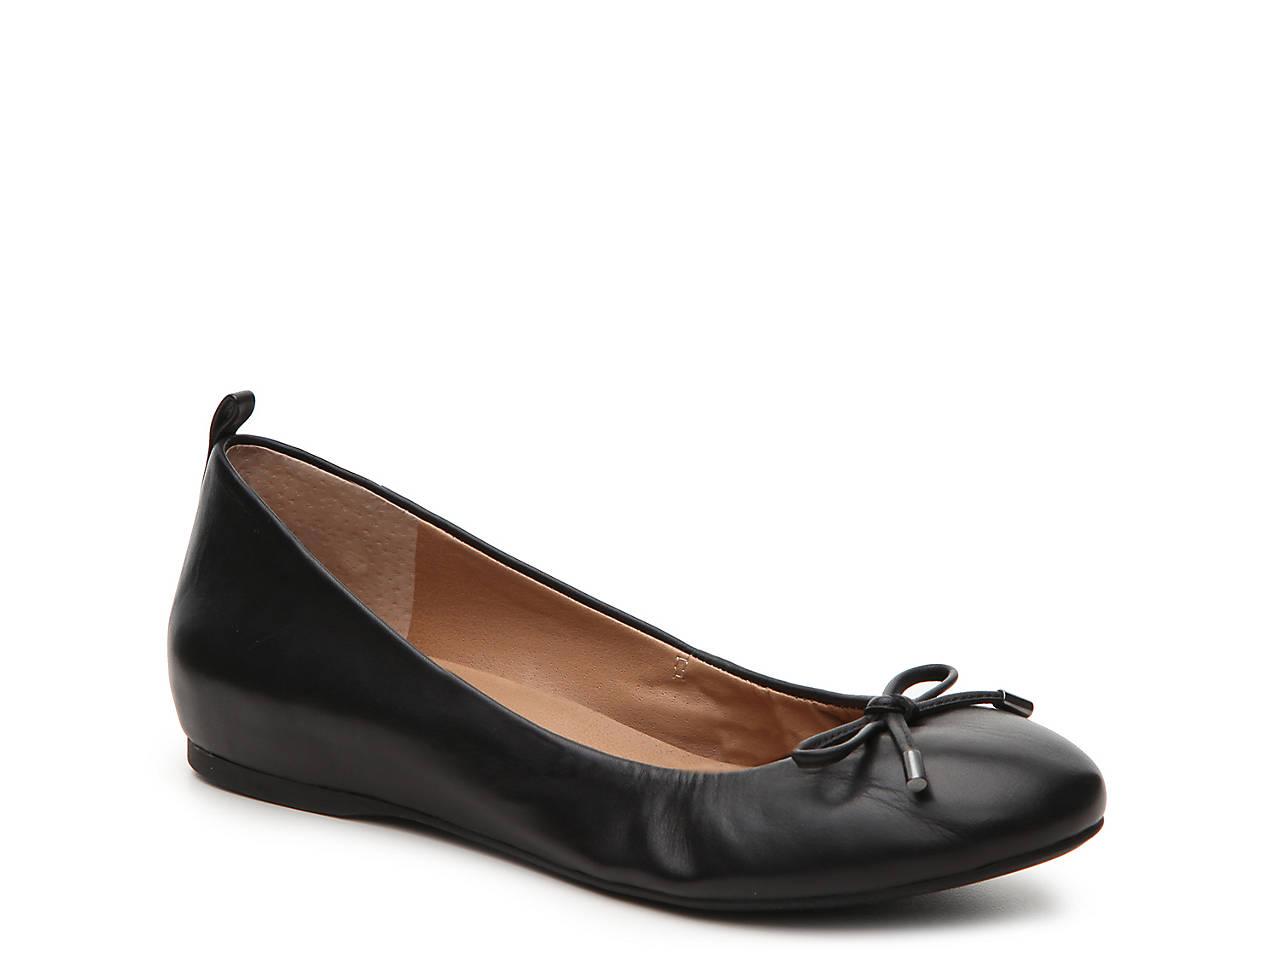 b5695b235c31 Audrey Brooke Newton Ballet Flat Women's Shoes | DSW